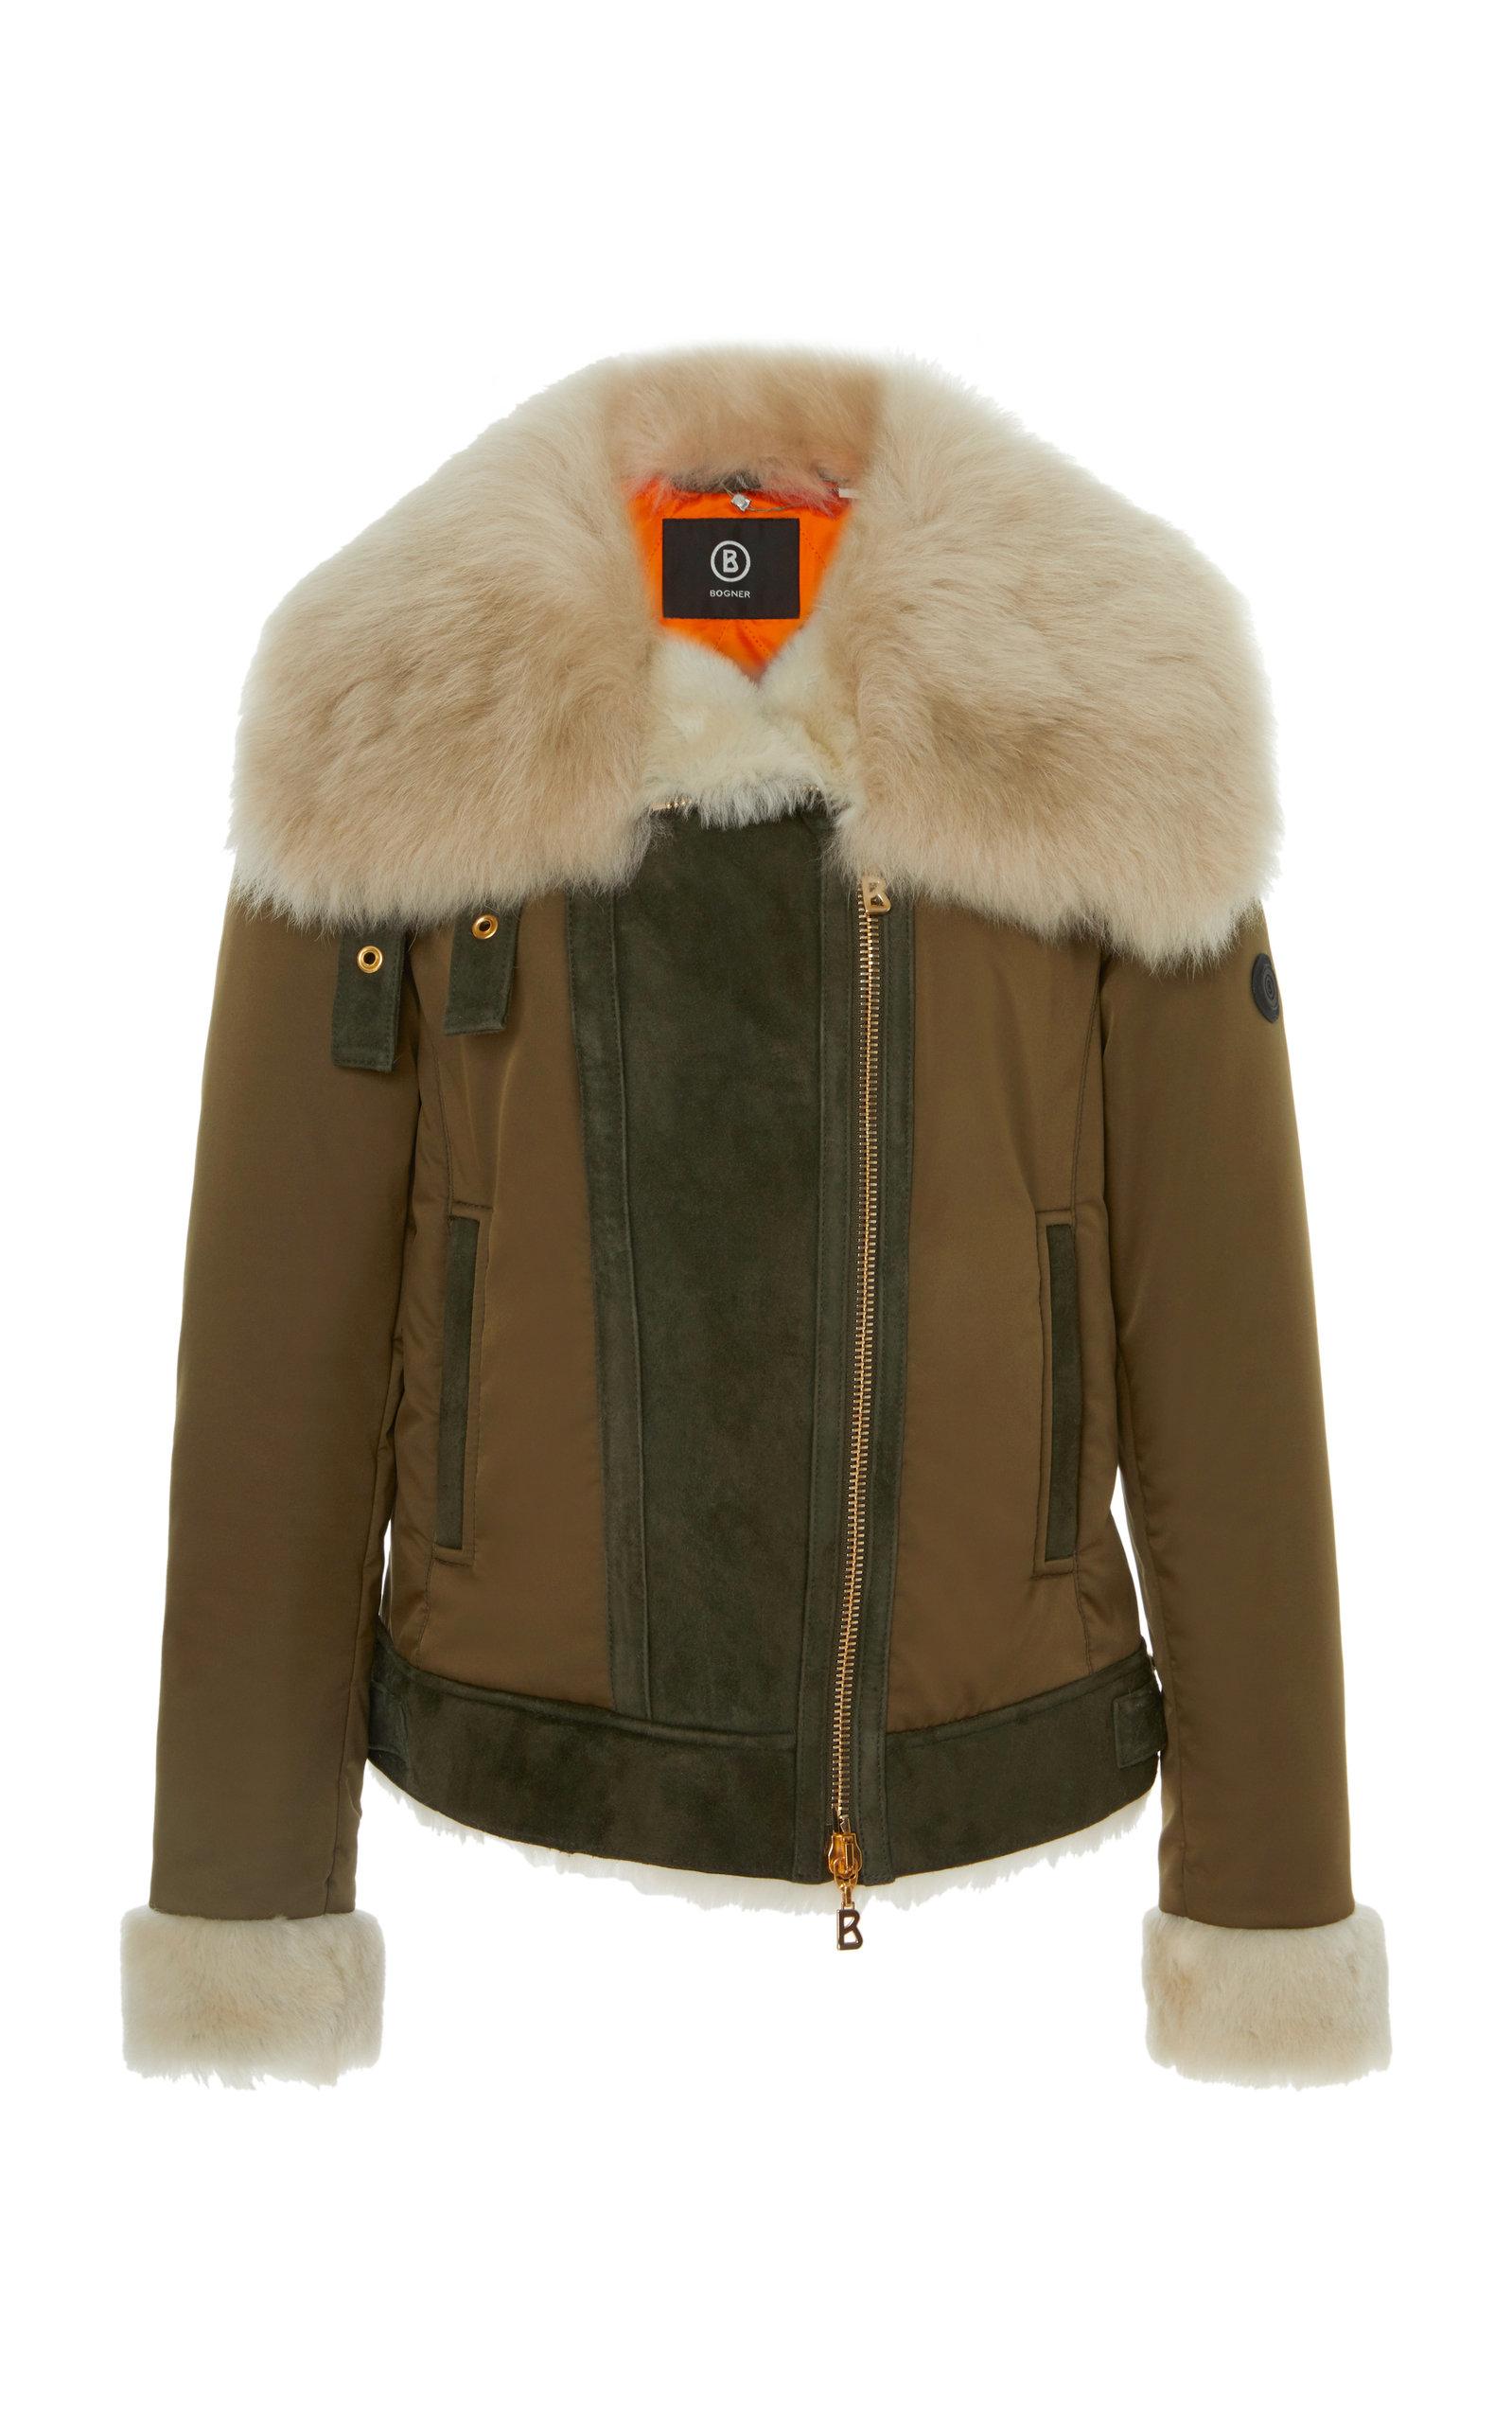 BOGNER X WHITE CUBE Raffi-L Fur Trimmed Lambskin Jacket in Brown